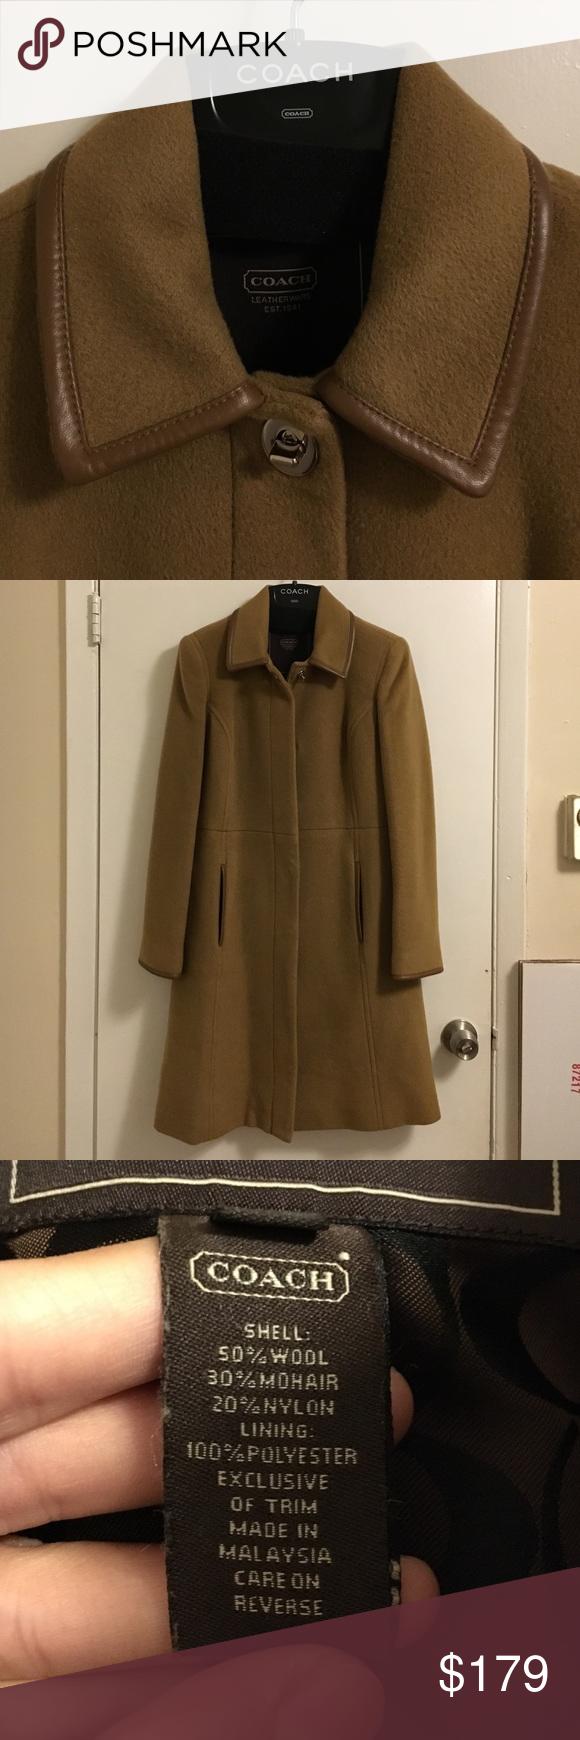 a274bebd3e5 Coach Knee-length Wool Coat EUC. Worn 2x. Leather trims on collar